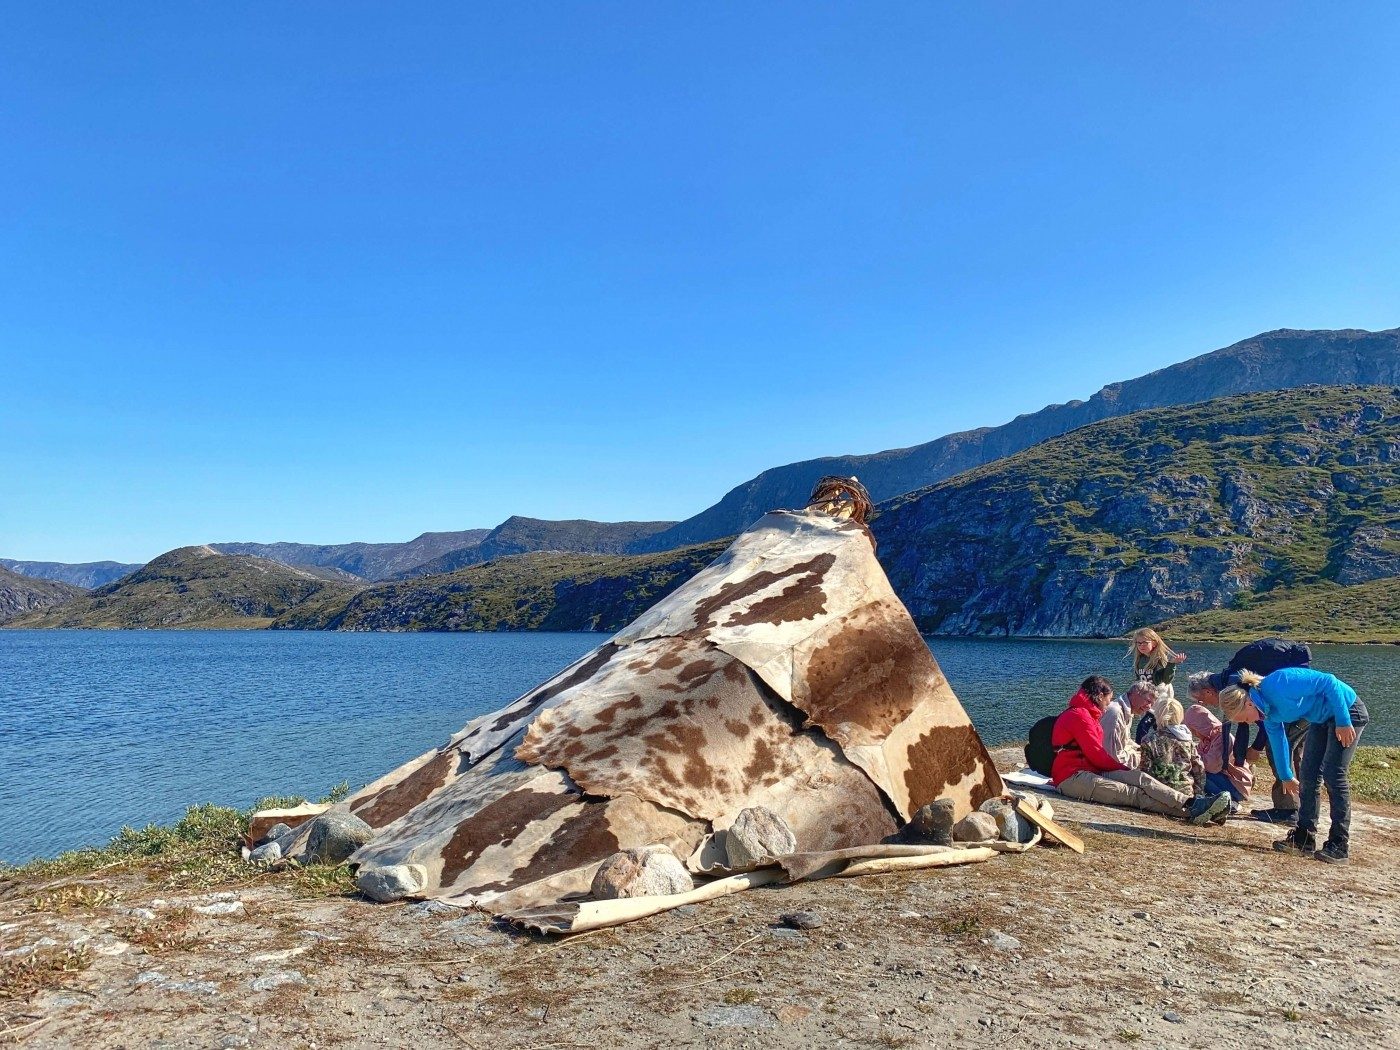 The Hotel Diskobay camp. Photo by Espen Andersen, Visit Greenland